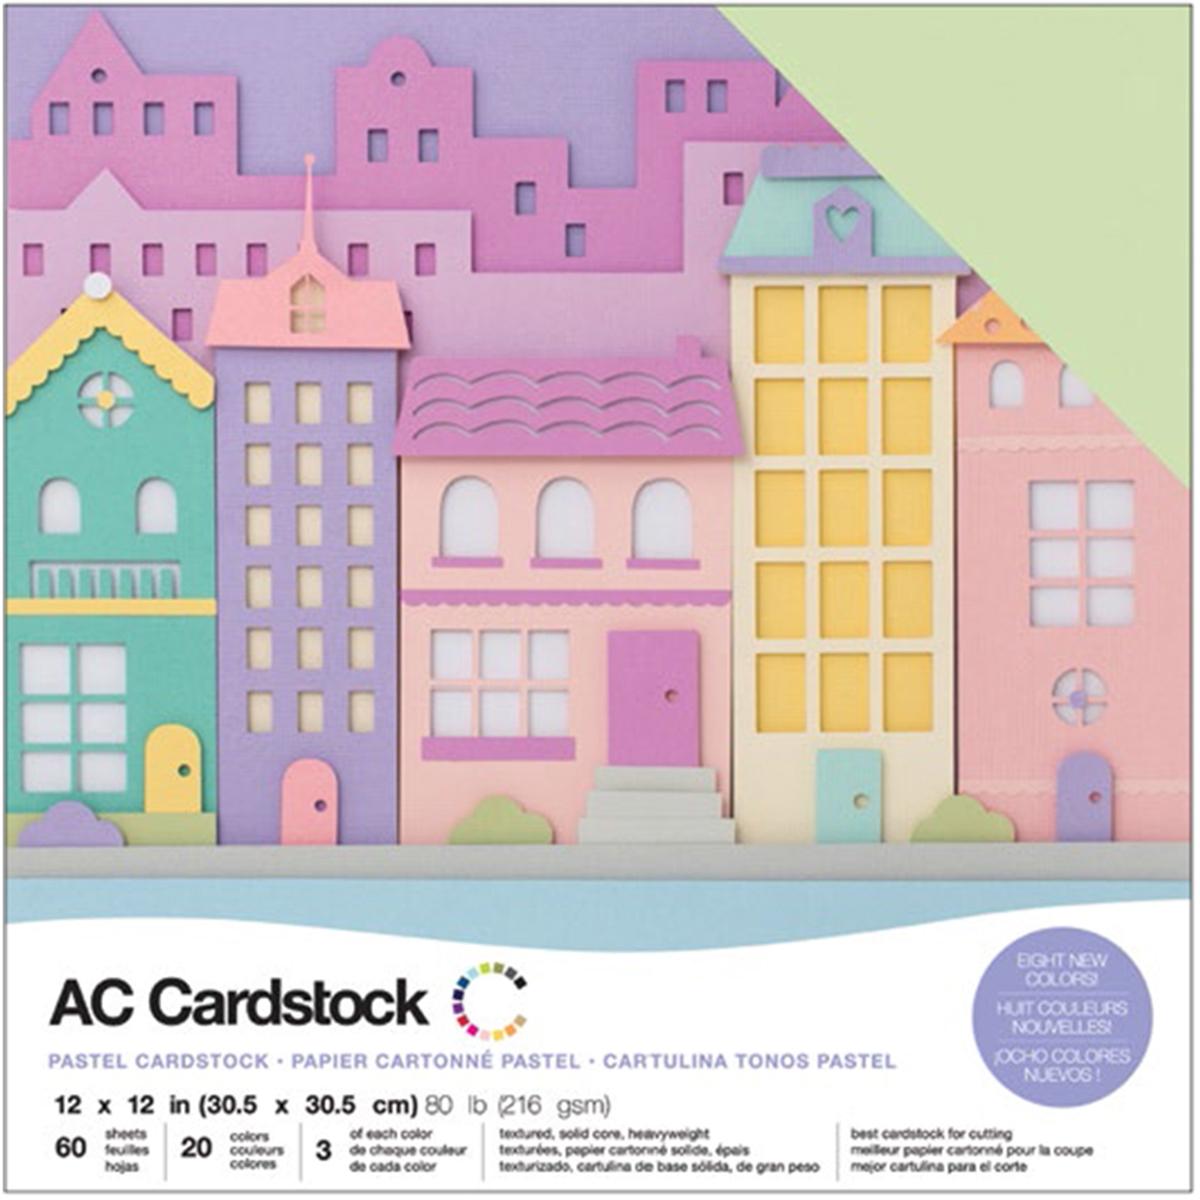 AC Cardstock - 12x12 Variety Pack, Pastels, 60/pkg